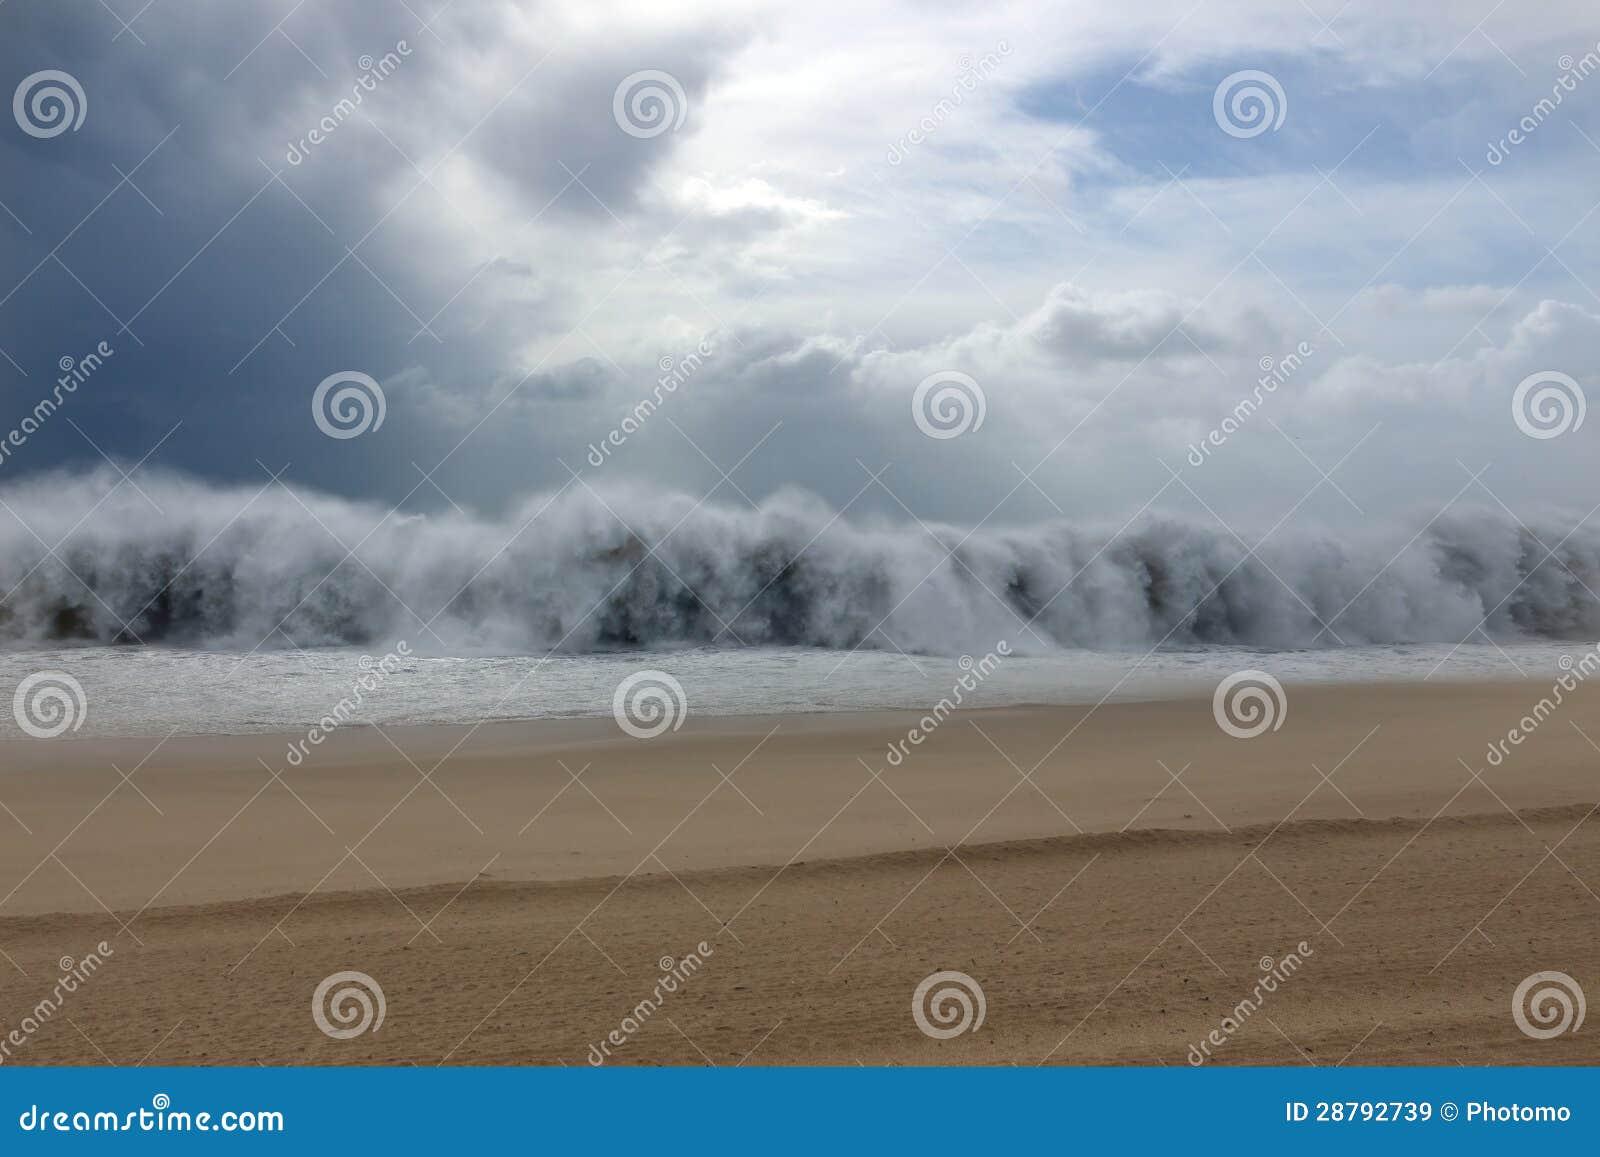 Onde de tsunami pendant une tempête